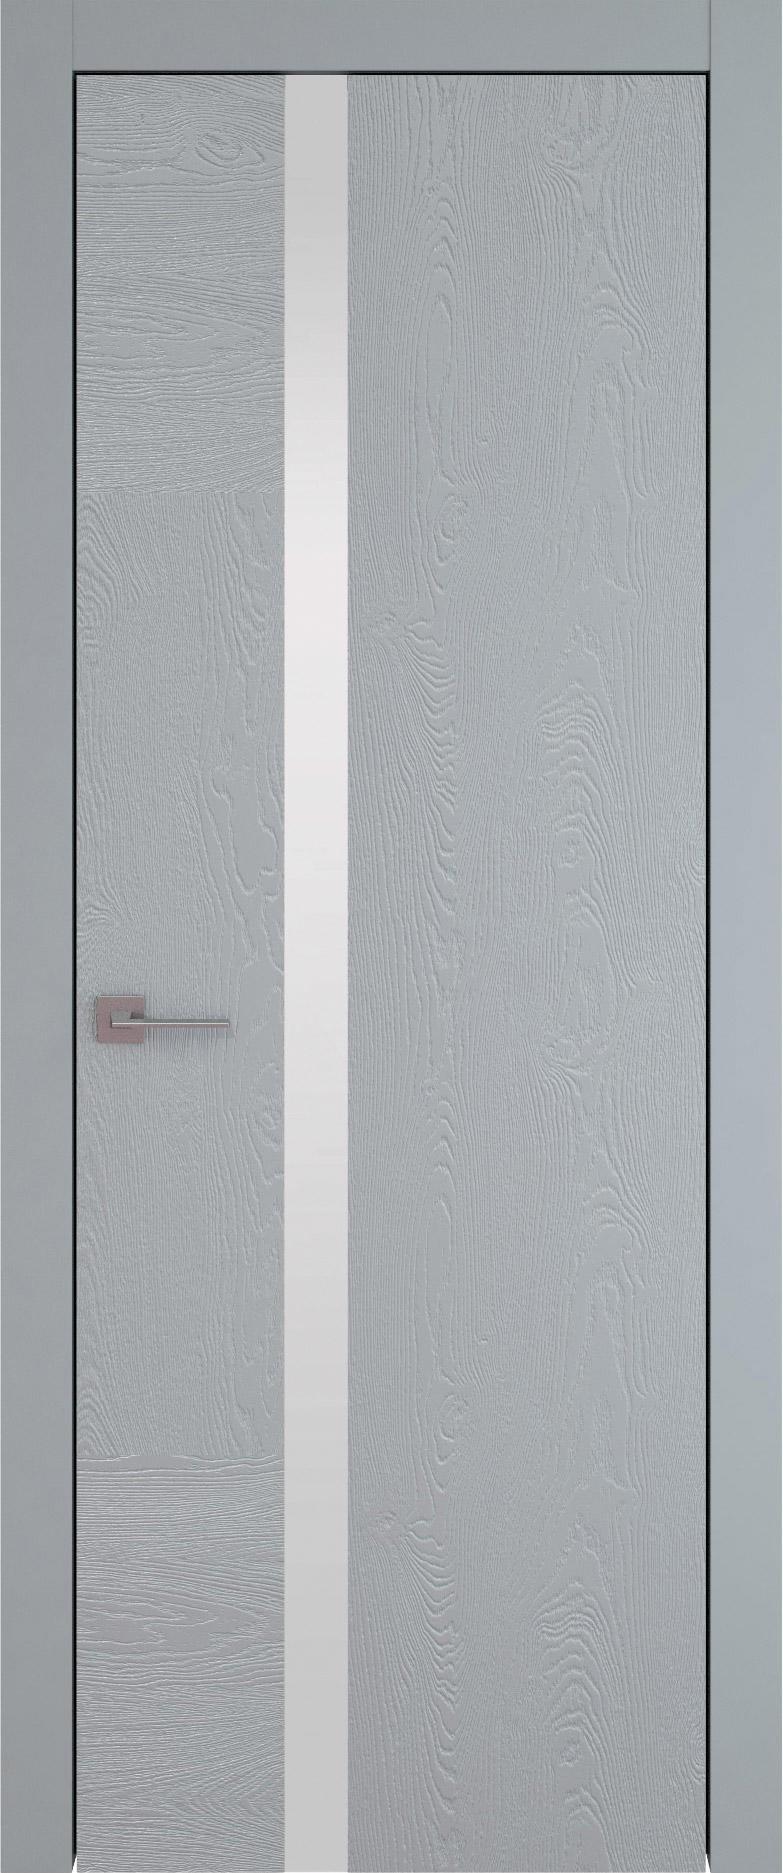 Tivoli Д-1 цвет - Серебристо-серая эмаль по шпону (RAL 7045) Без стекла (ДГ)